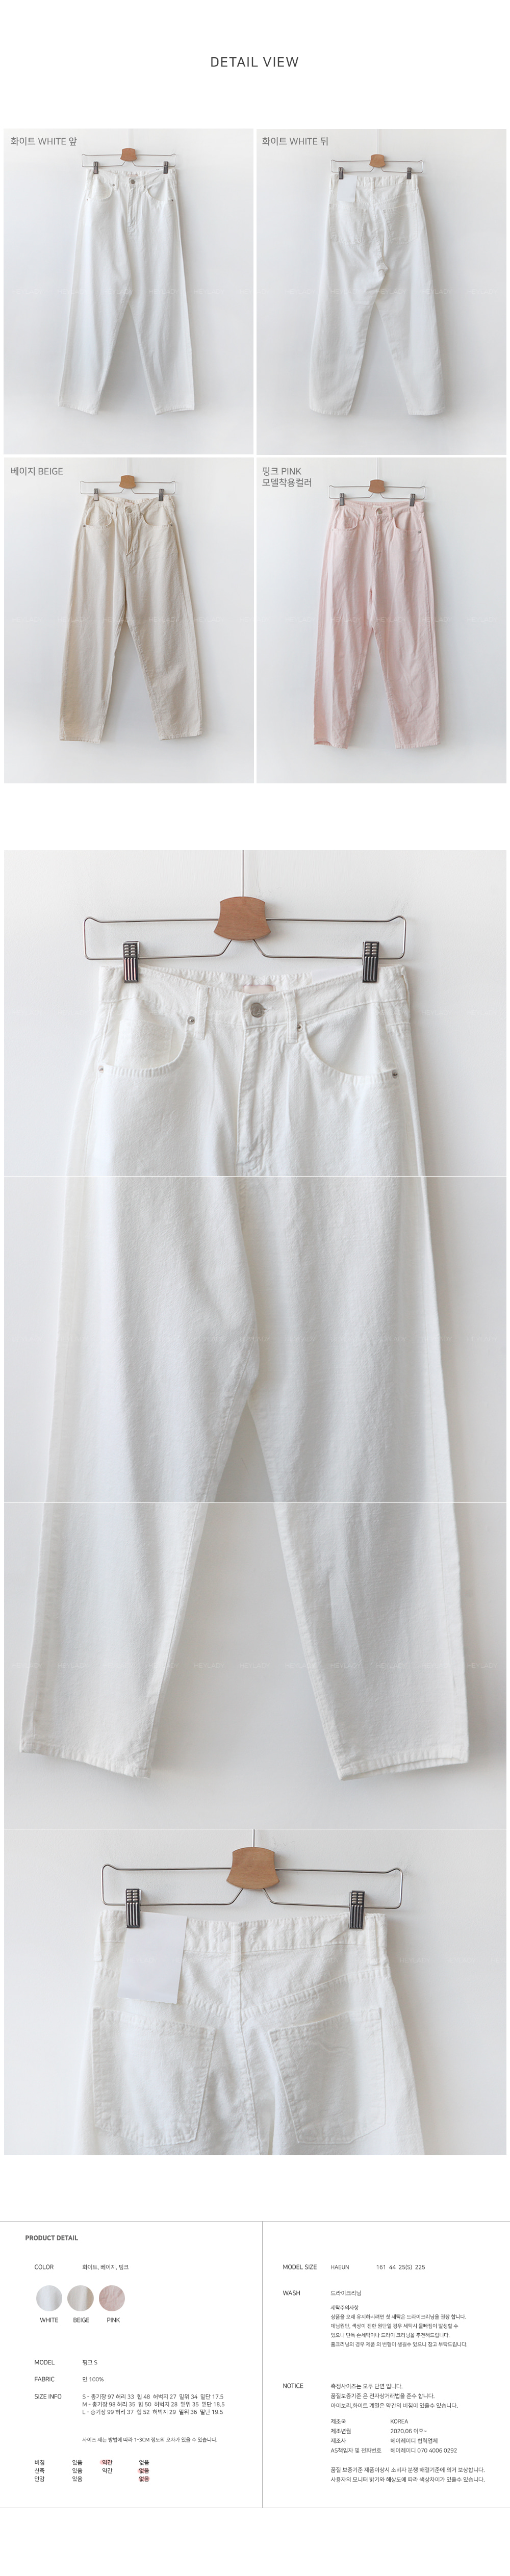 Virginia Date Cotton Pants